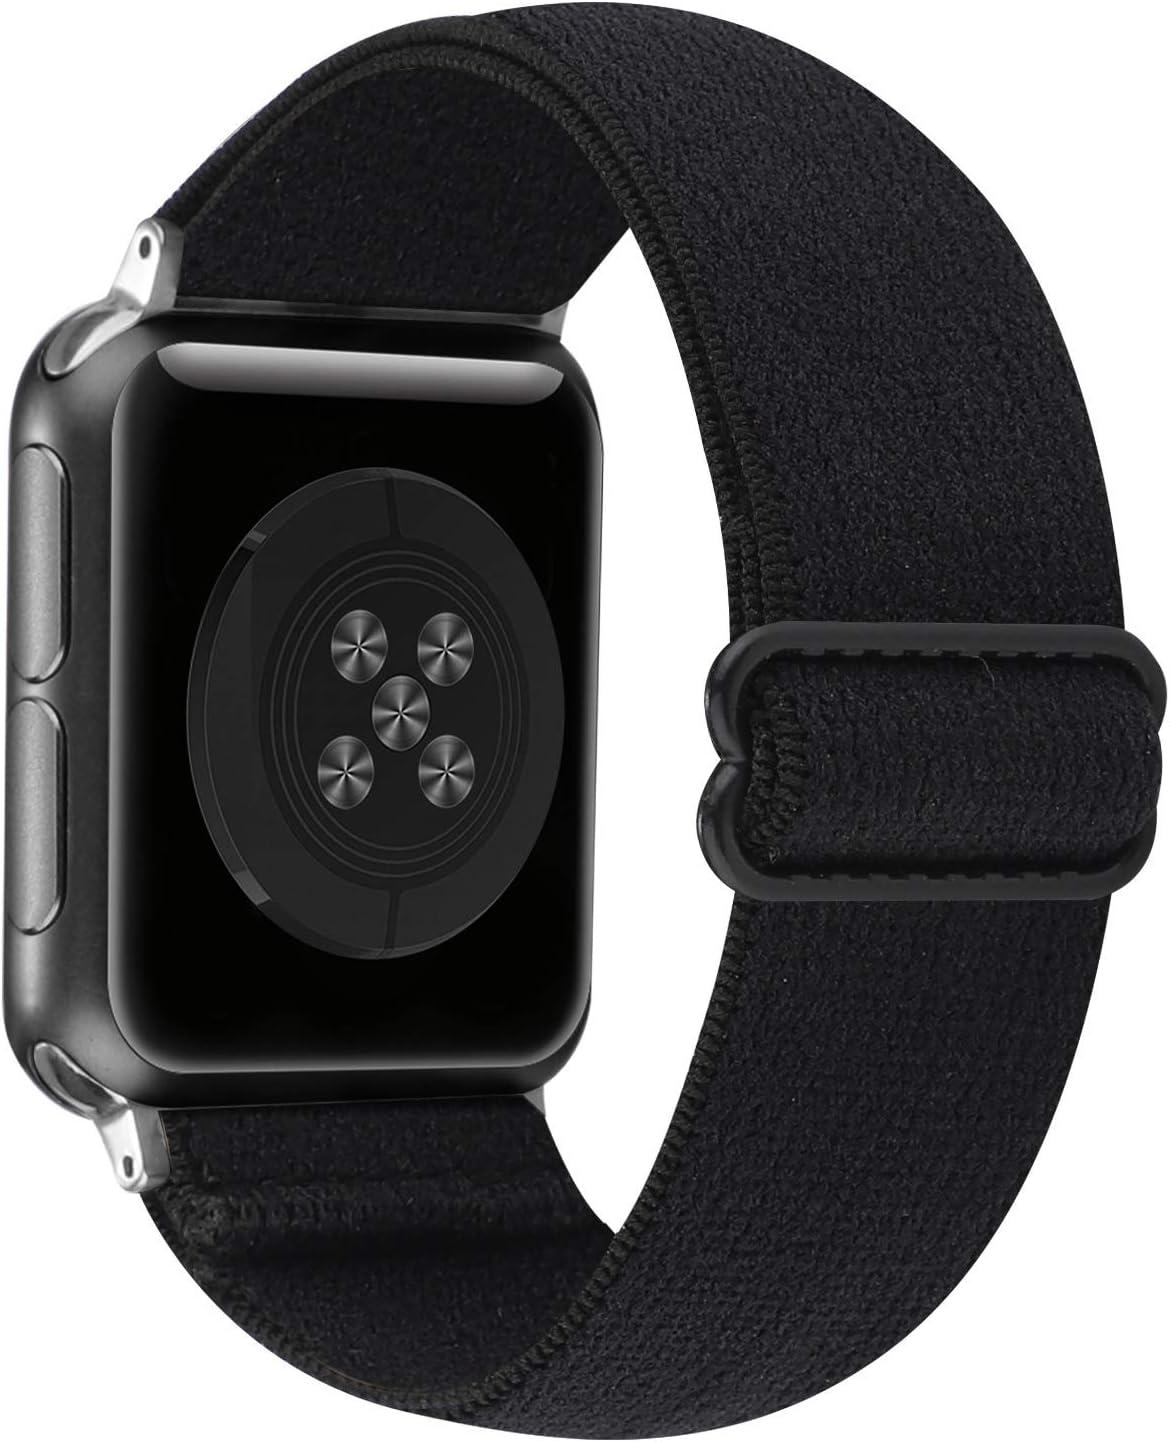 Correa De Nylon Ajustable Apple Watch Series 6/5/4/3/2/1 Se